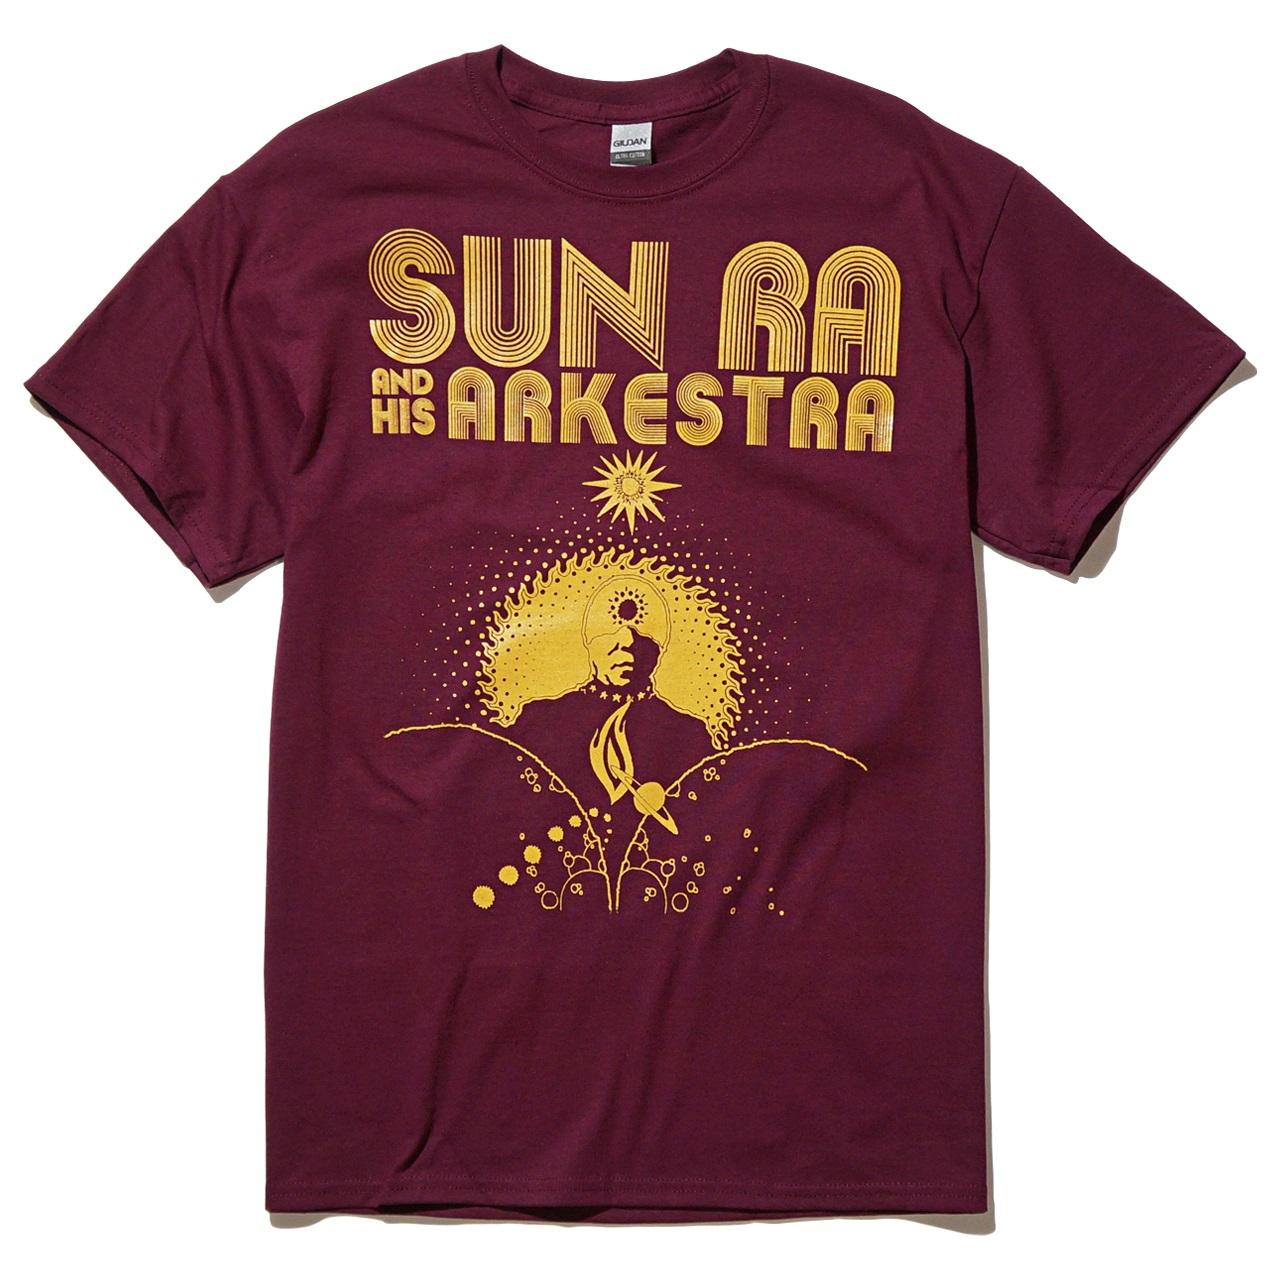 SUN RA & HIS ARKESTRA Tシャツ Cosmic-Maroon